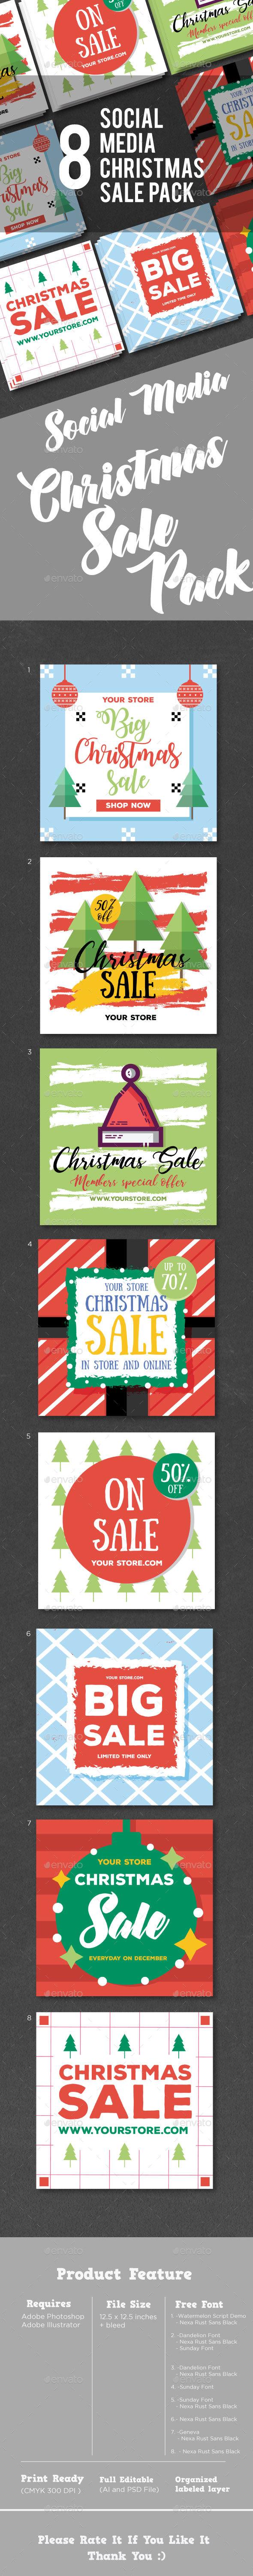 Christmas Sale Social Media Pack - Social Media Web Elements